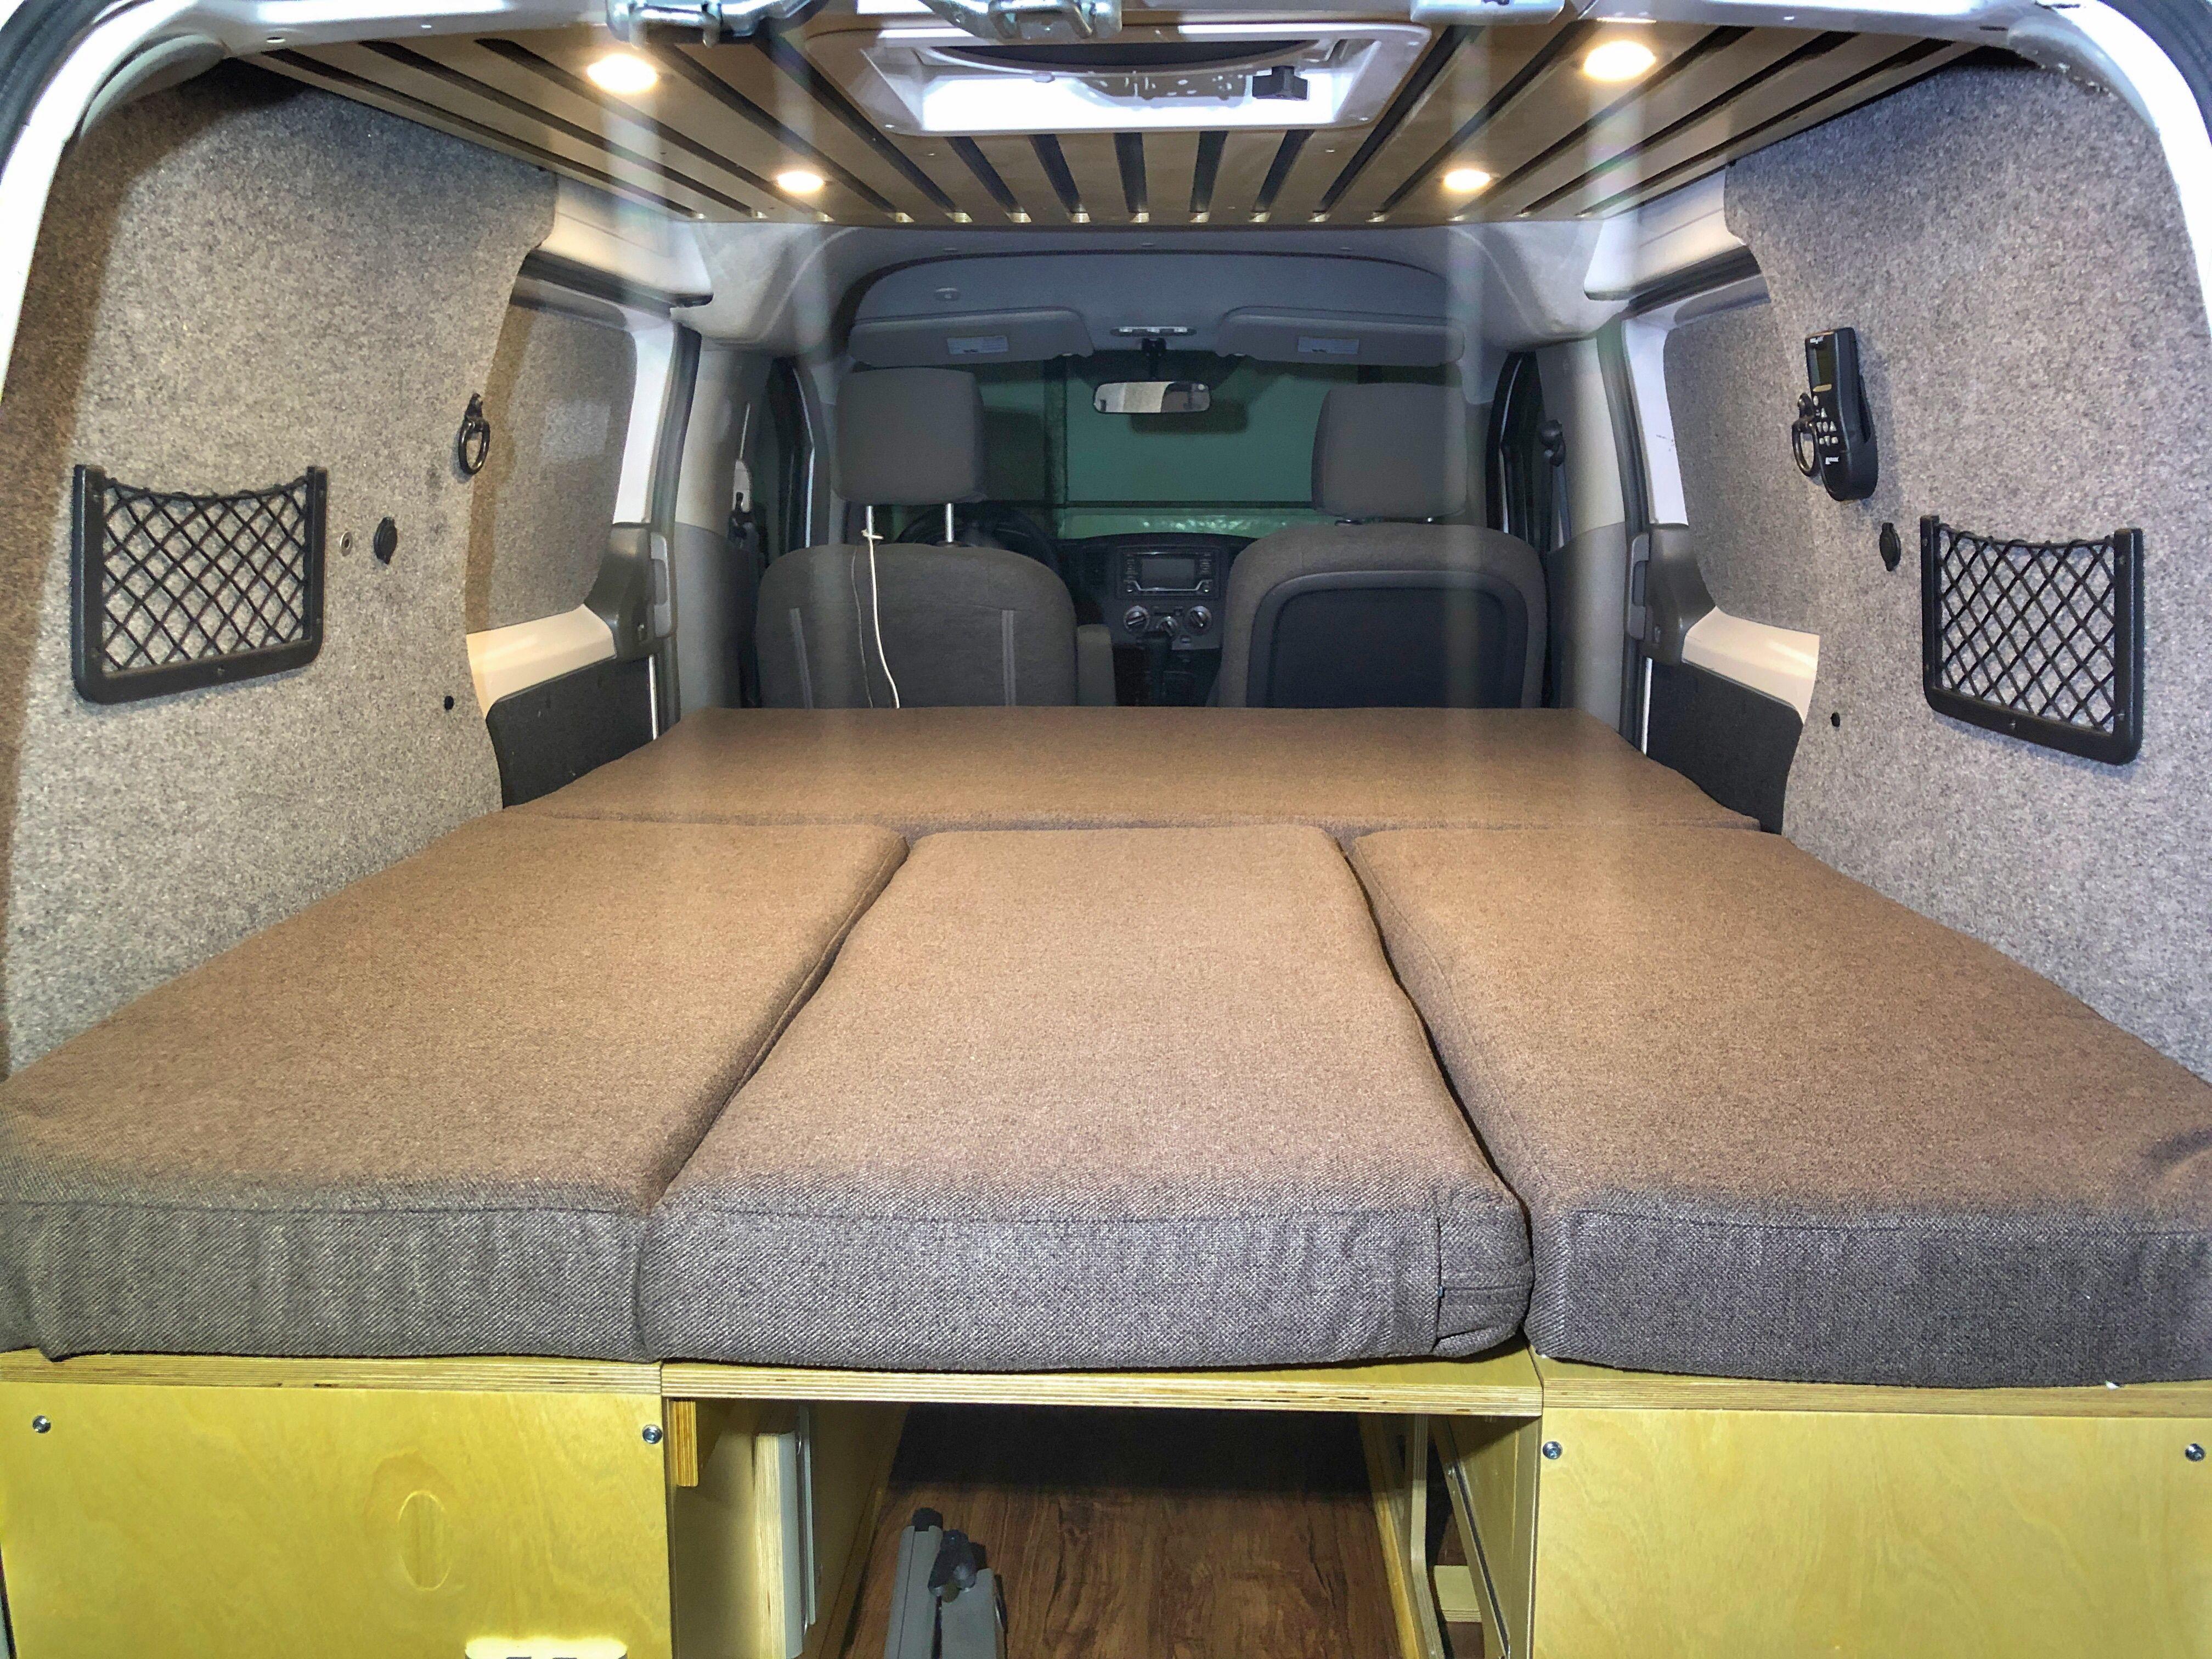 nv200 campervan conversion convertible